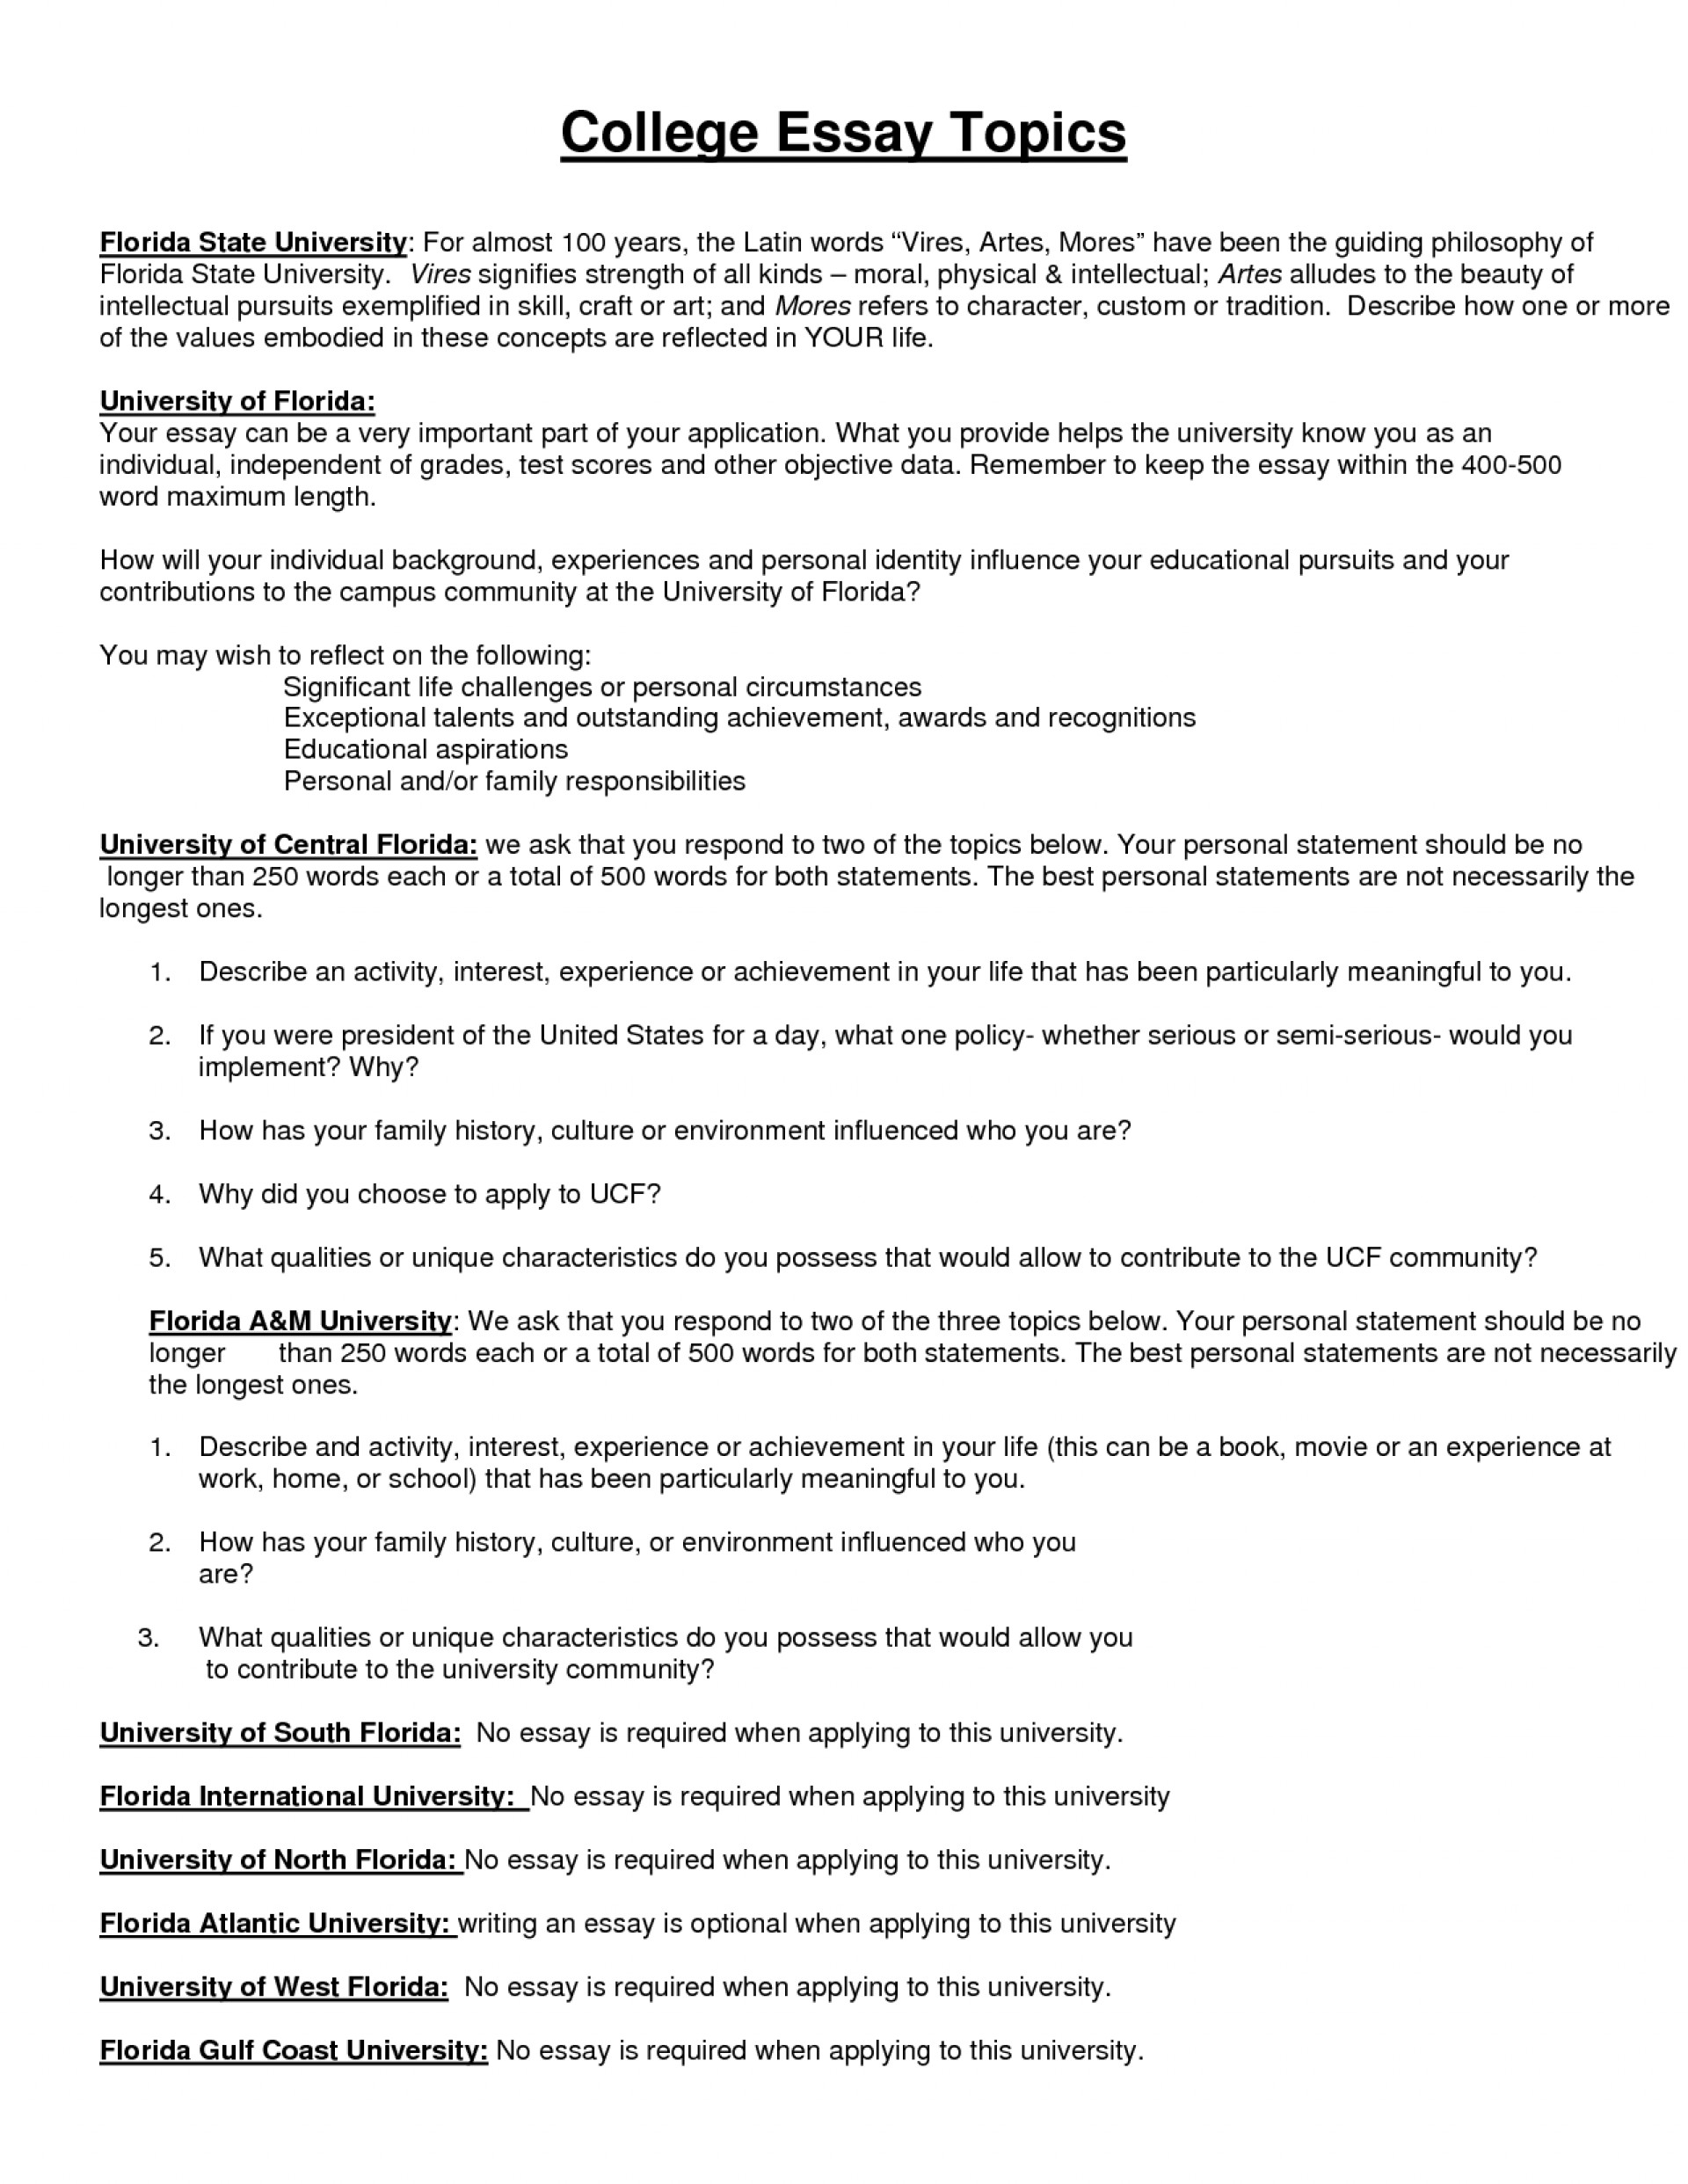 003 Essay Example 4khqbt5dlt Creative College Marvelous Topics 2017 Unique 2018 1920